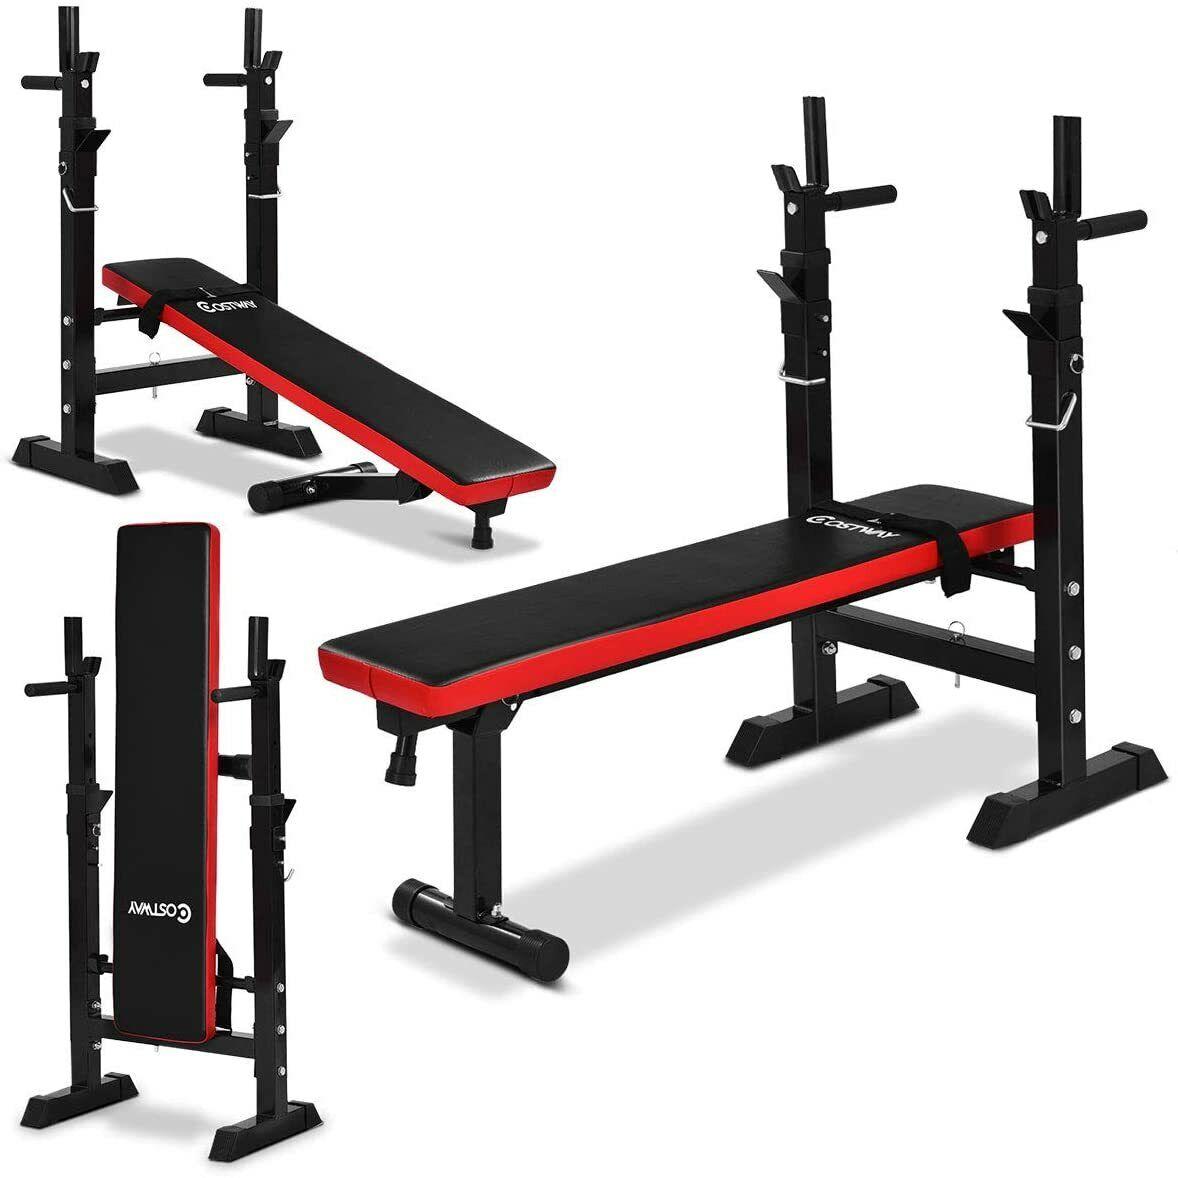 Hantelbank Trainingsbank Flachbank Fitnessgerät Kraftstation klappbar Dip-Griff